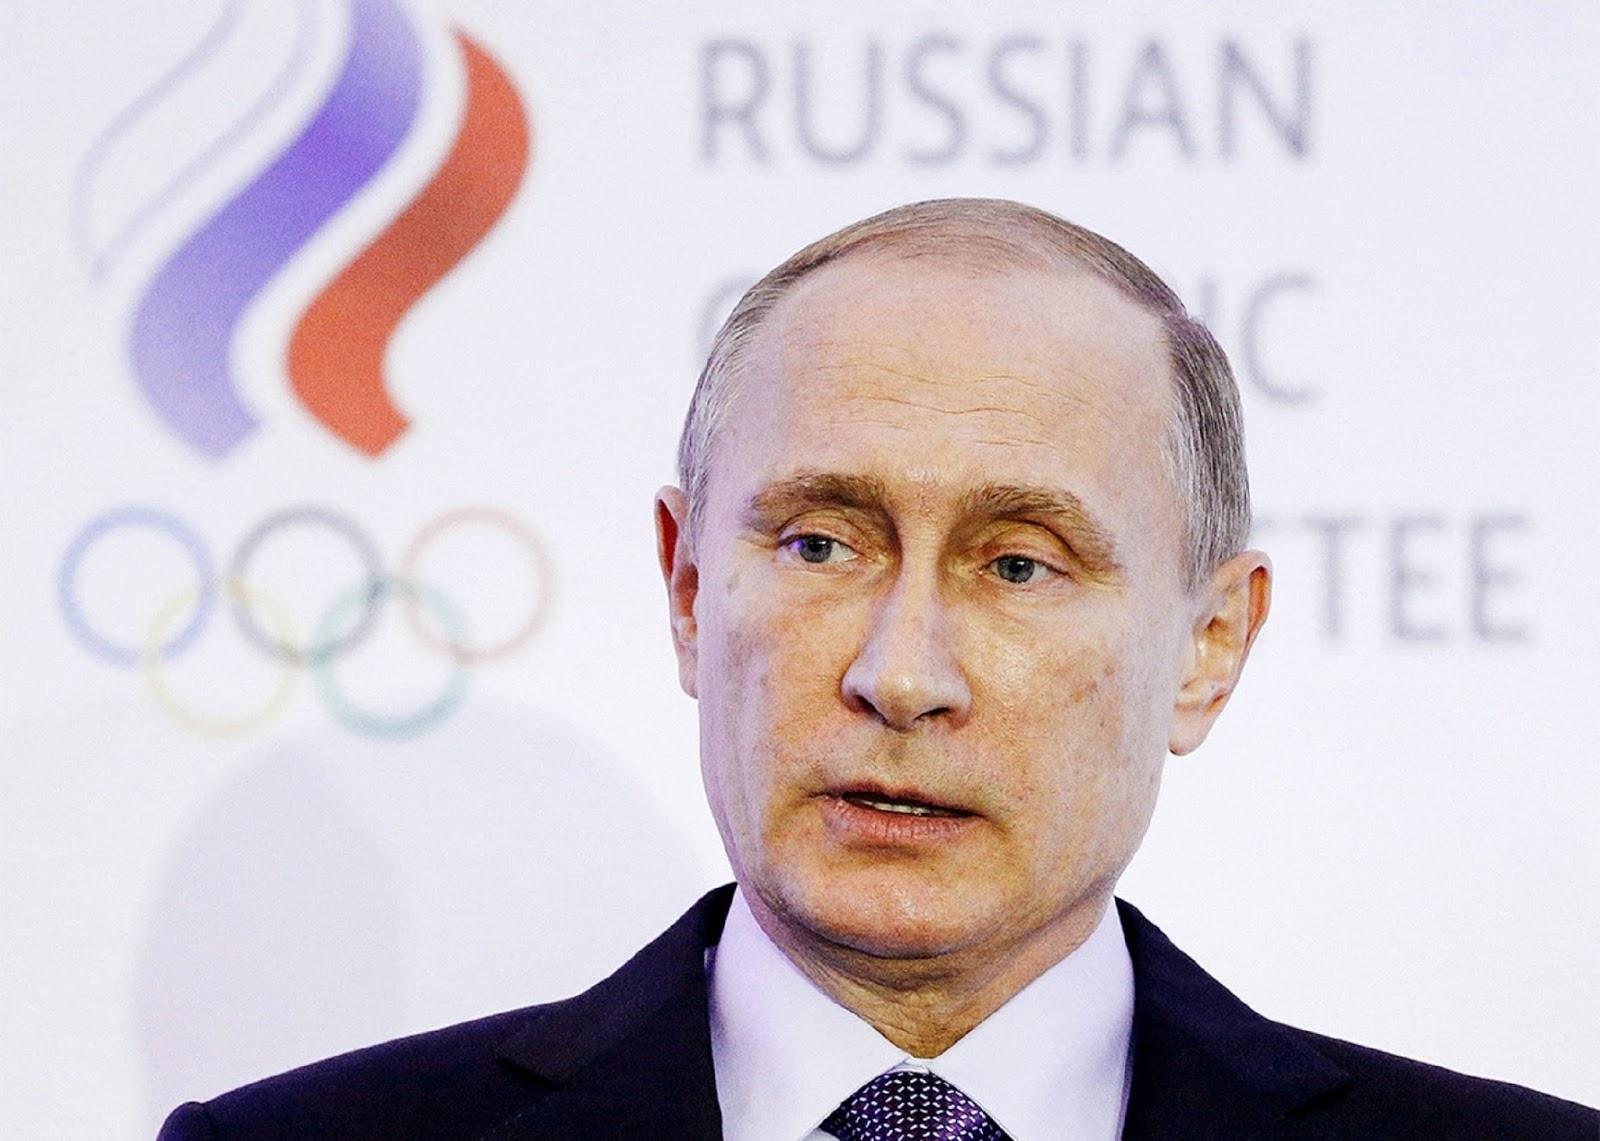 RUSSIA 2016 RIO OLYMPICS 2